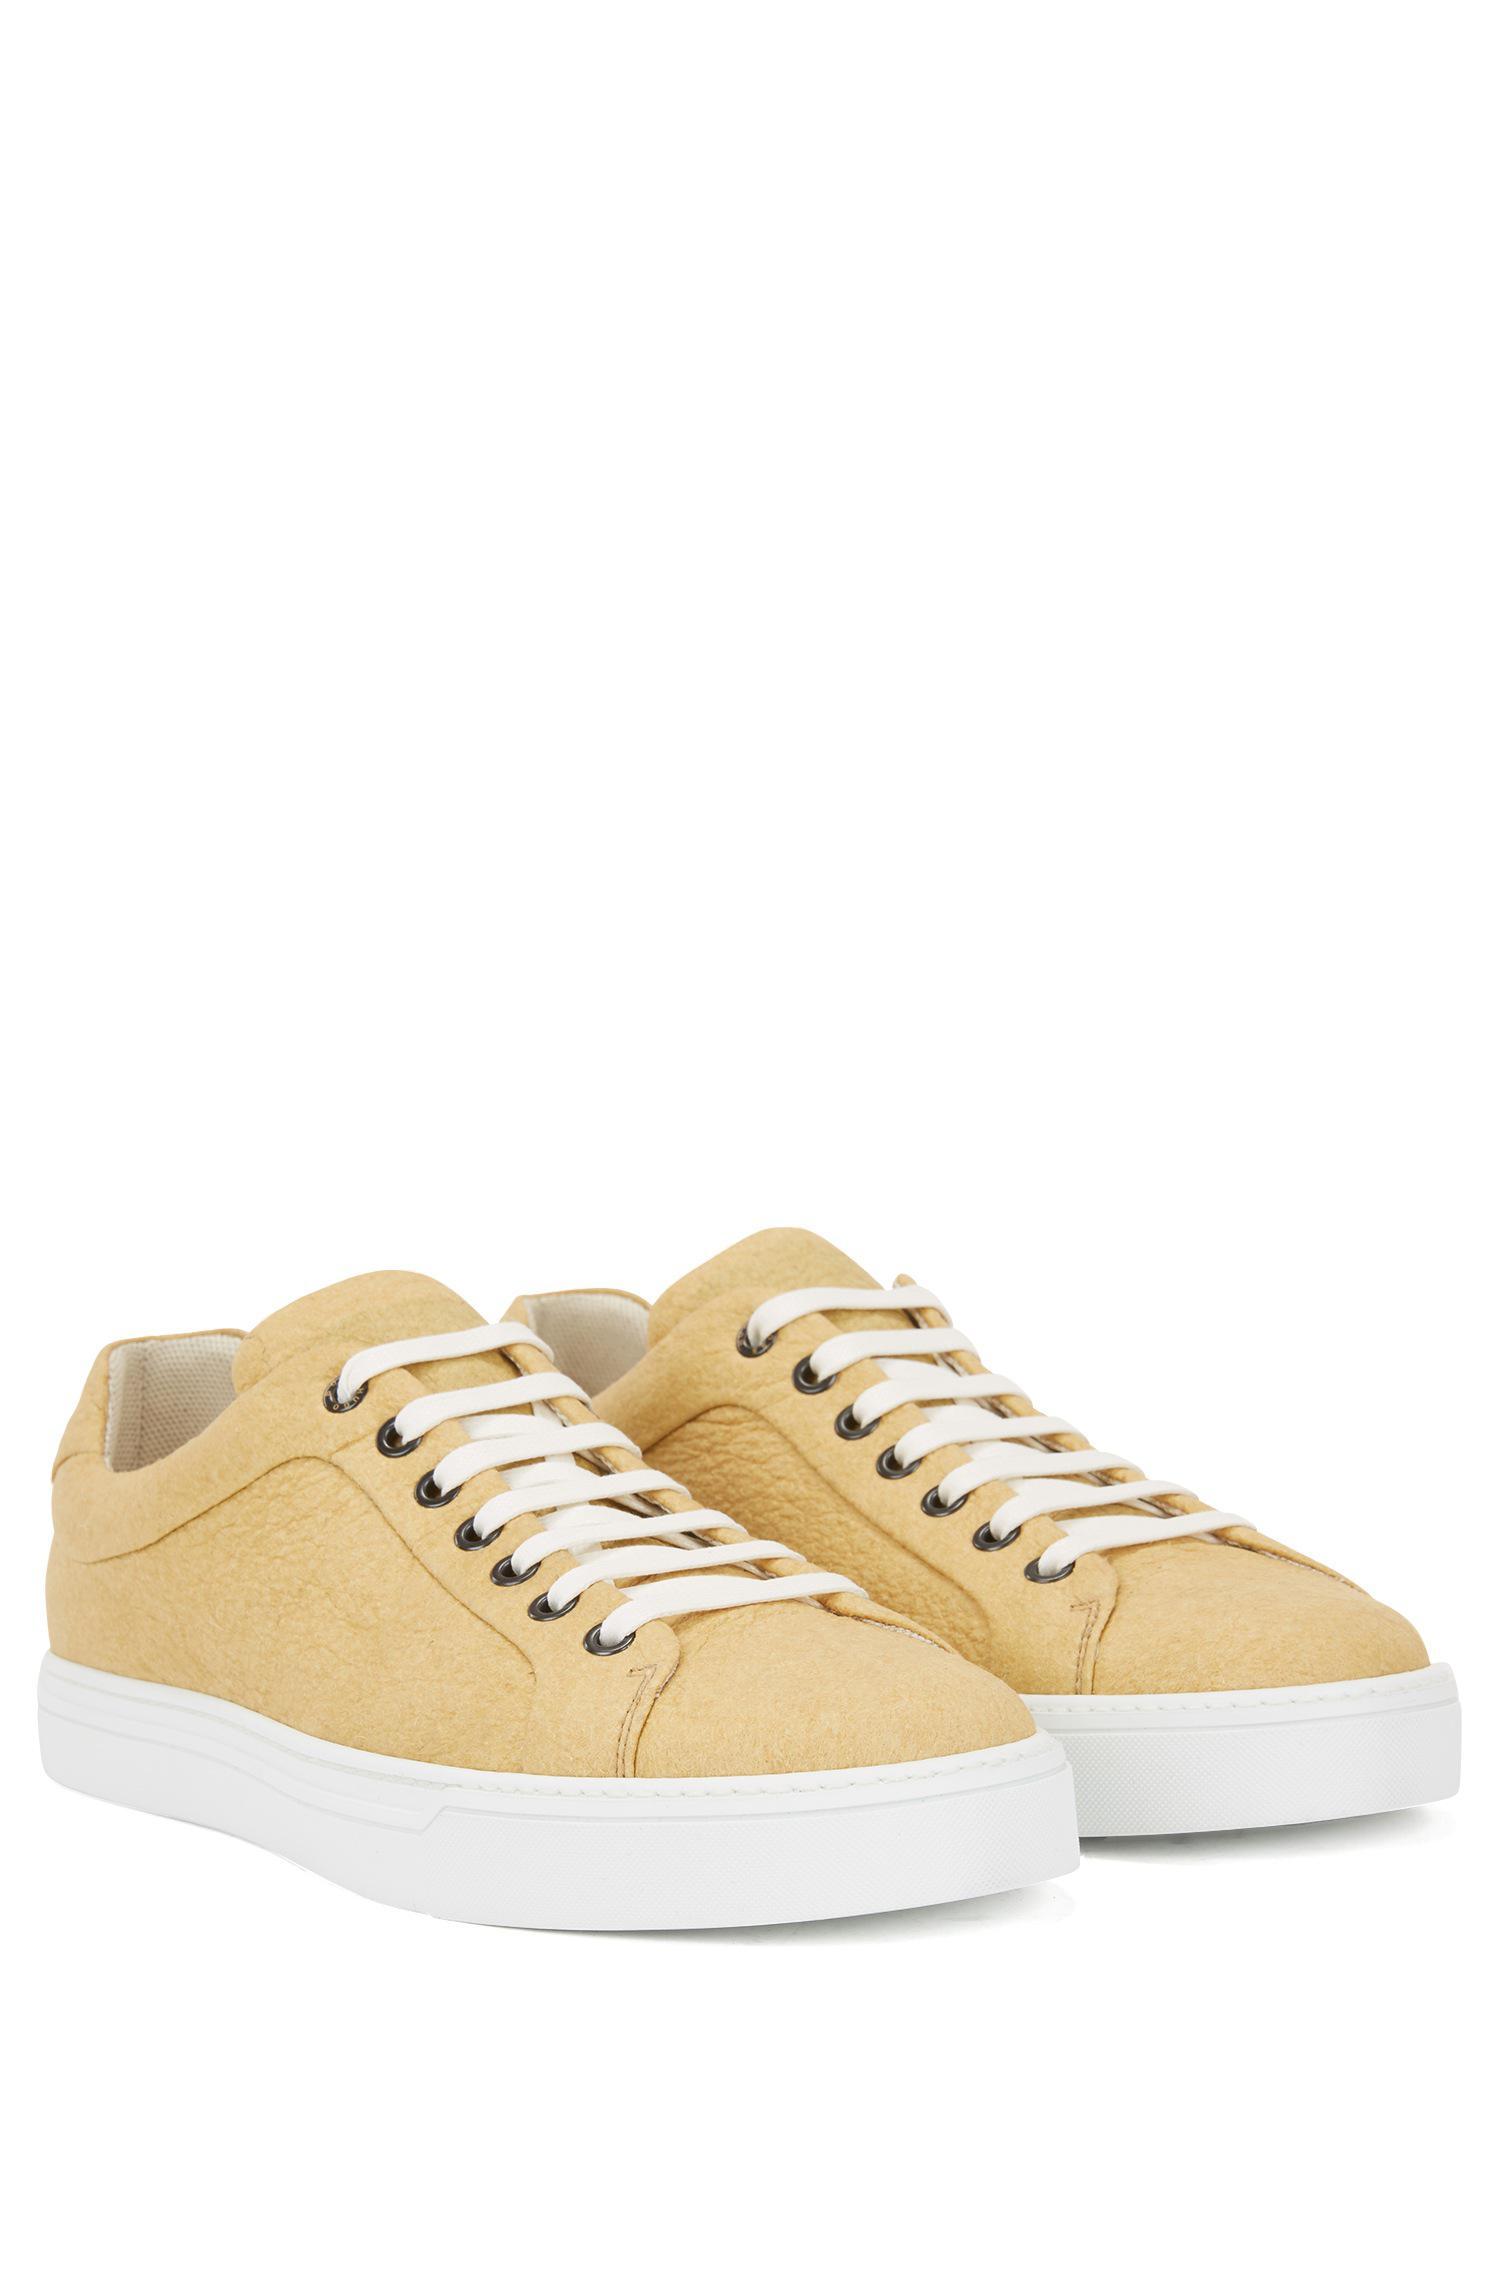 e546a3e7fb9 BOSS - Yellow Limited-edition 100% Vegan Sneakers In Piñatex® for Men -.  View fullscreen